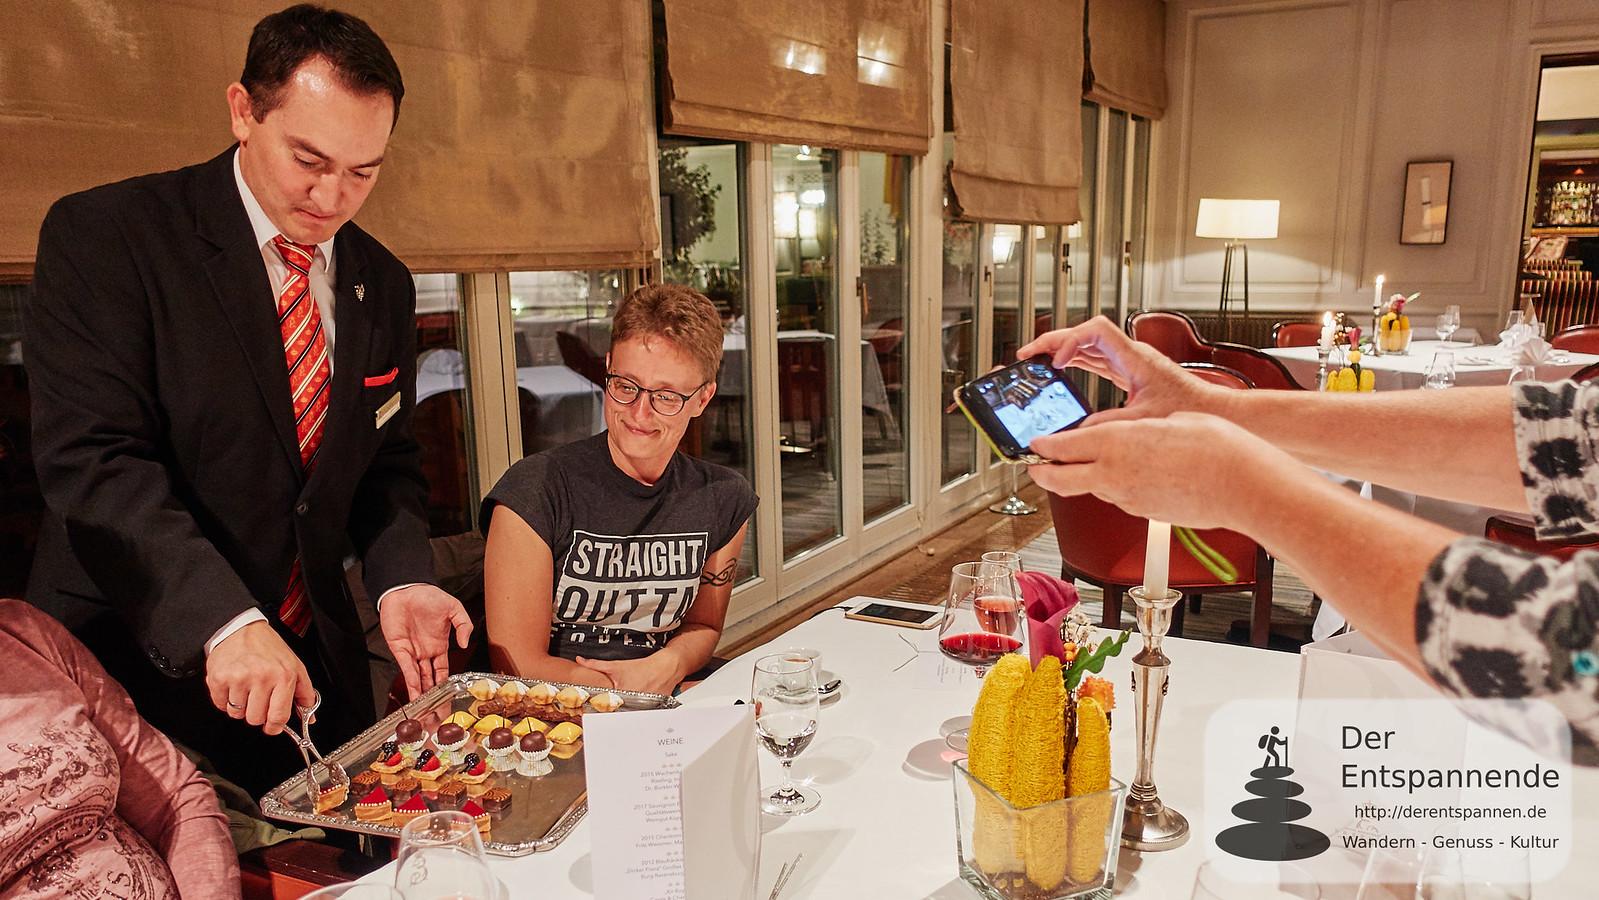 Pralinen nach dem Menü im Hotel Restaurant Erbprinz Ettlingen